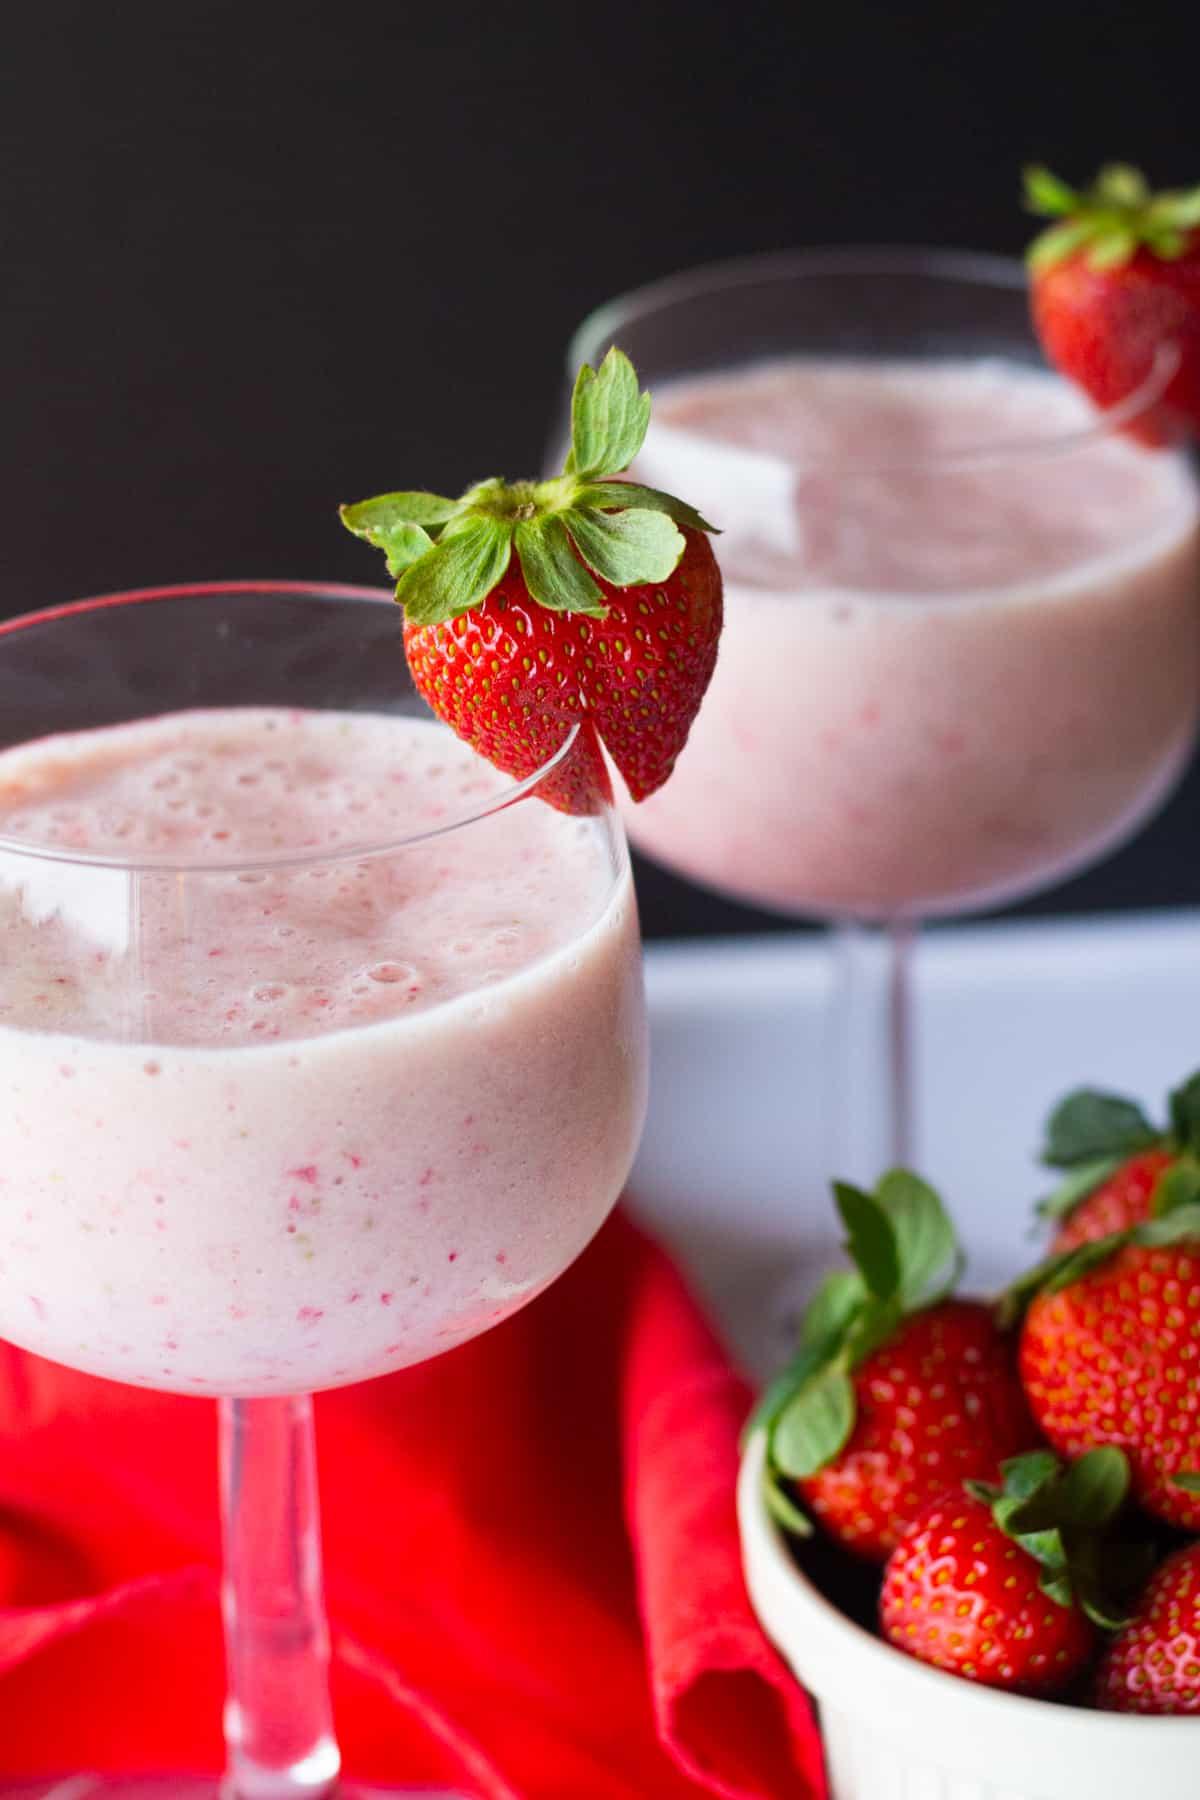 this strawberry milkshake recipe is healthy as it has no ice cream.